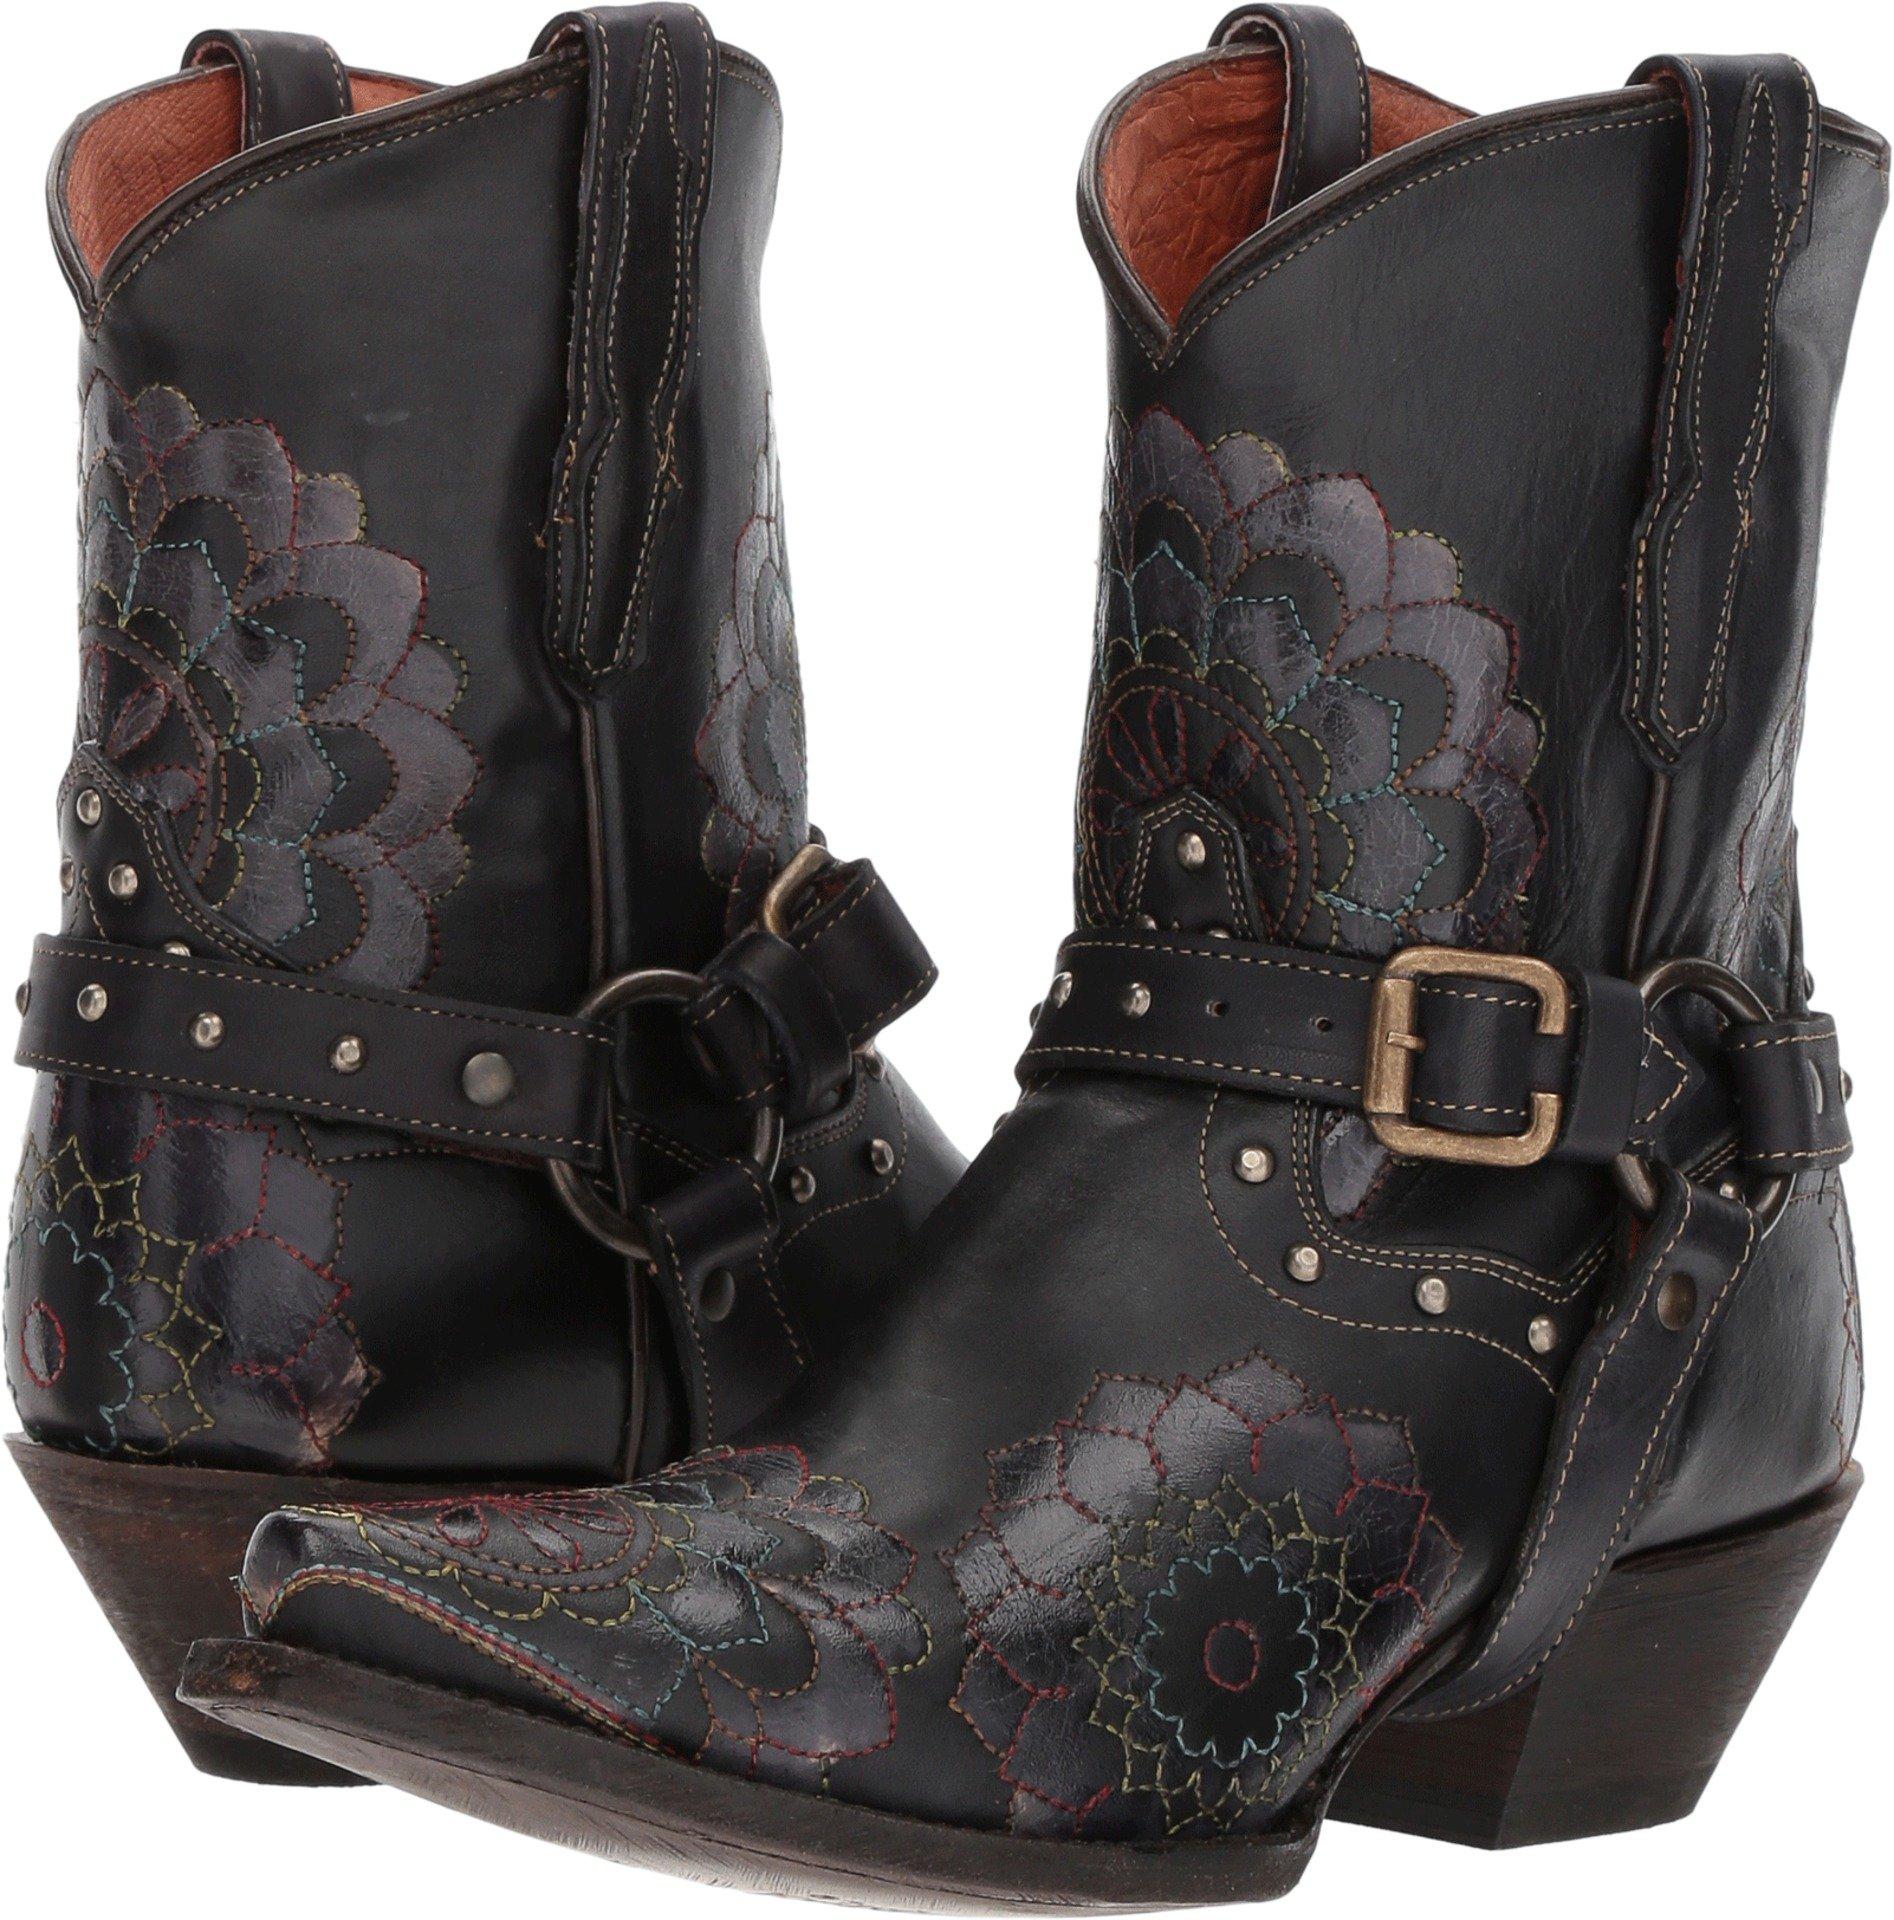 Dan Post Western Boots Womens Leslie 7.5 M Black Floral DP3545 by Dan Post Boot Company (Image #1)